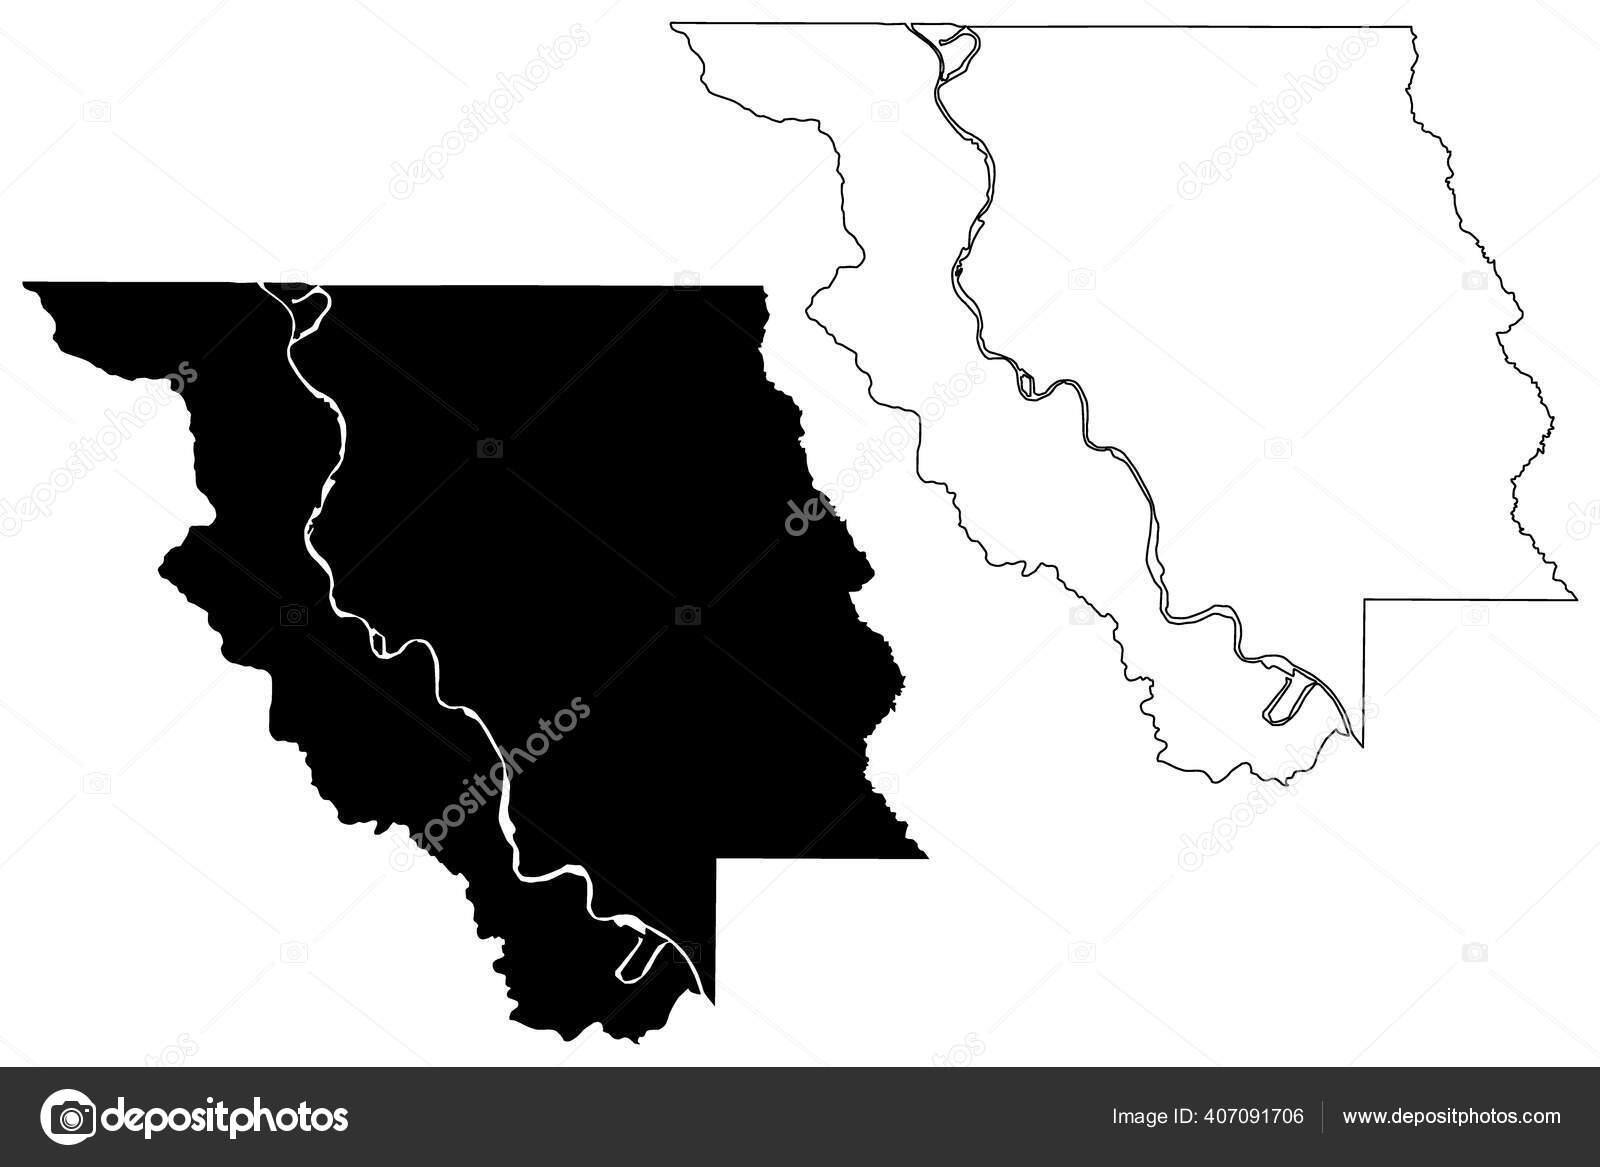 Red River County Louisiana County United States America Usa Map Stok Vektor C Danler 407091706